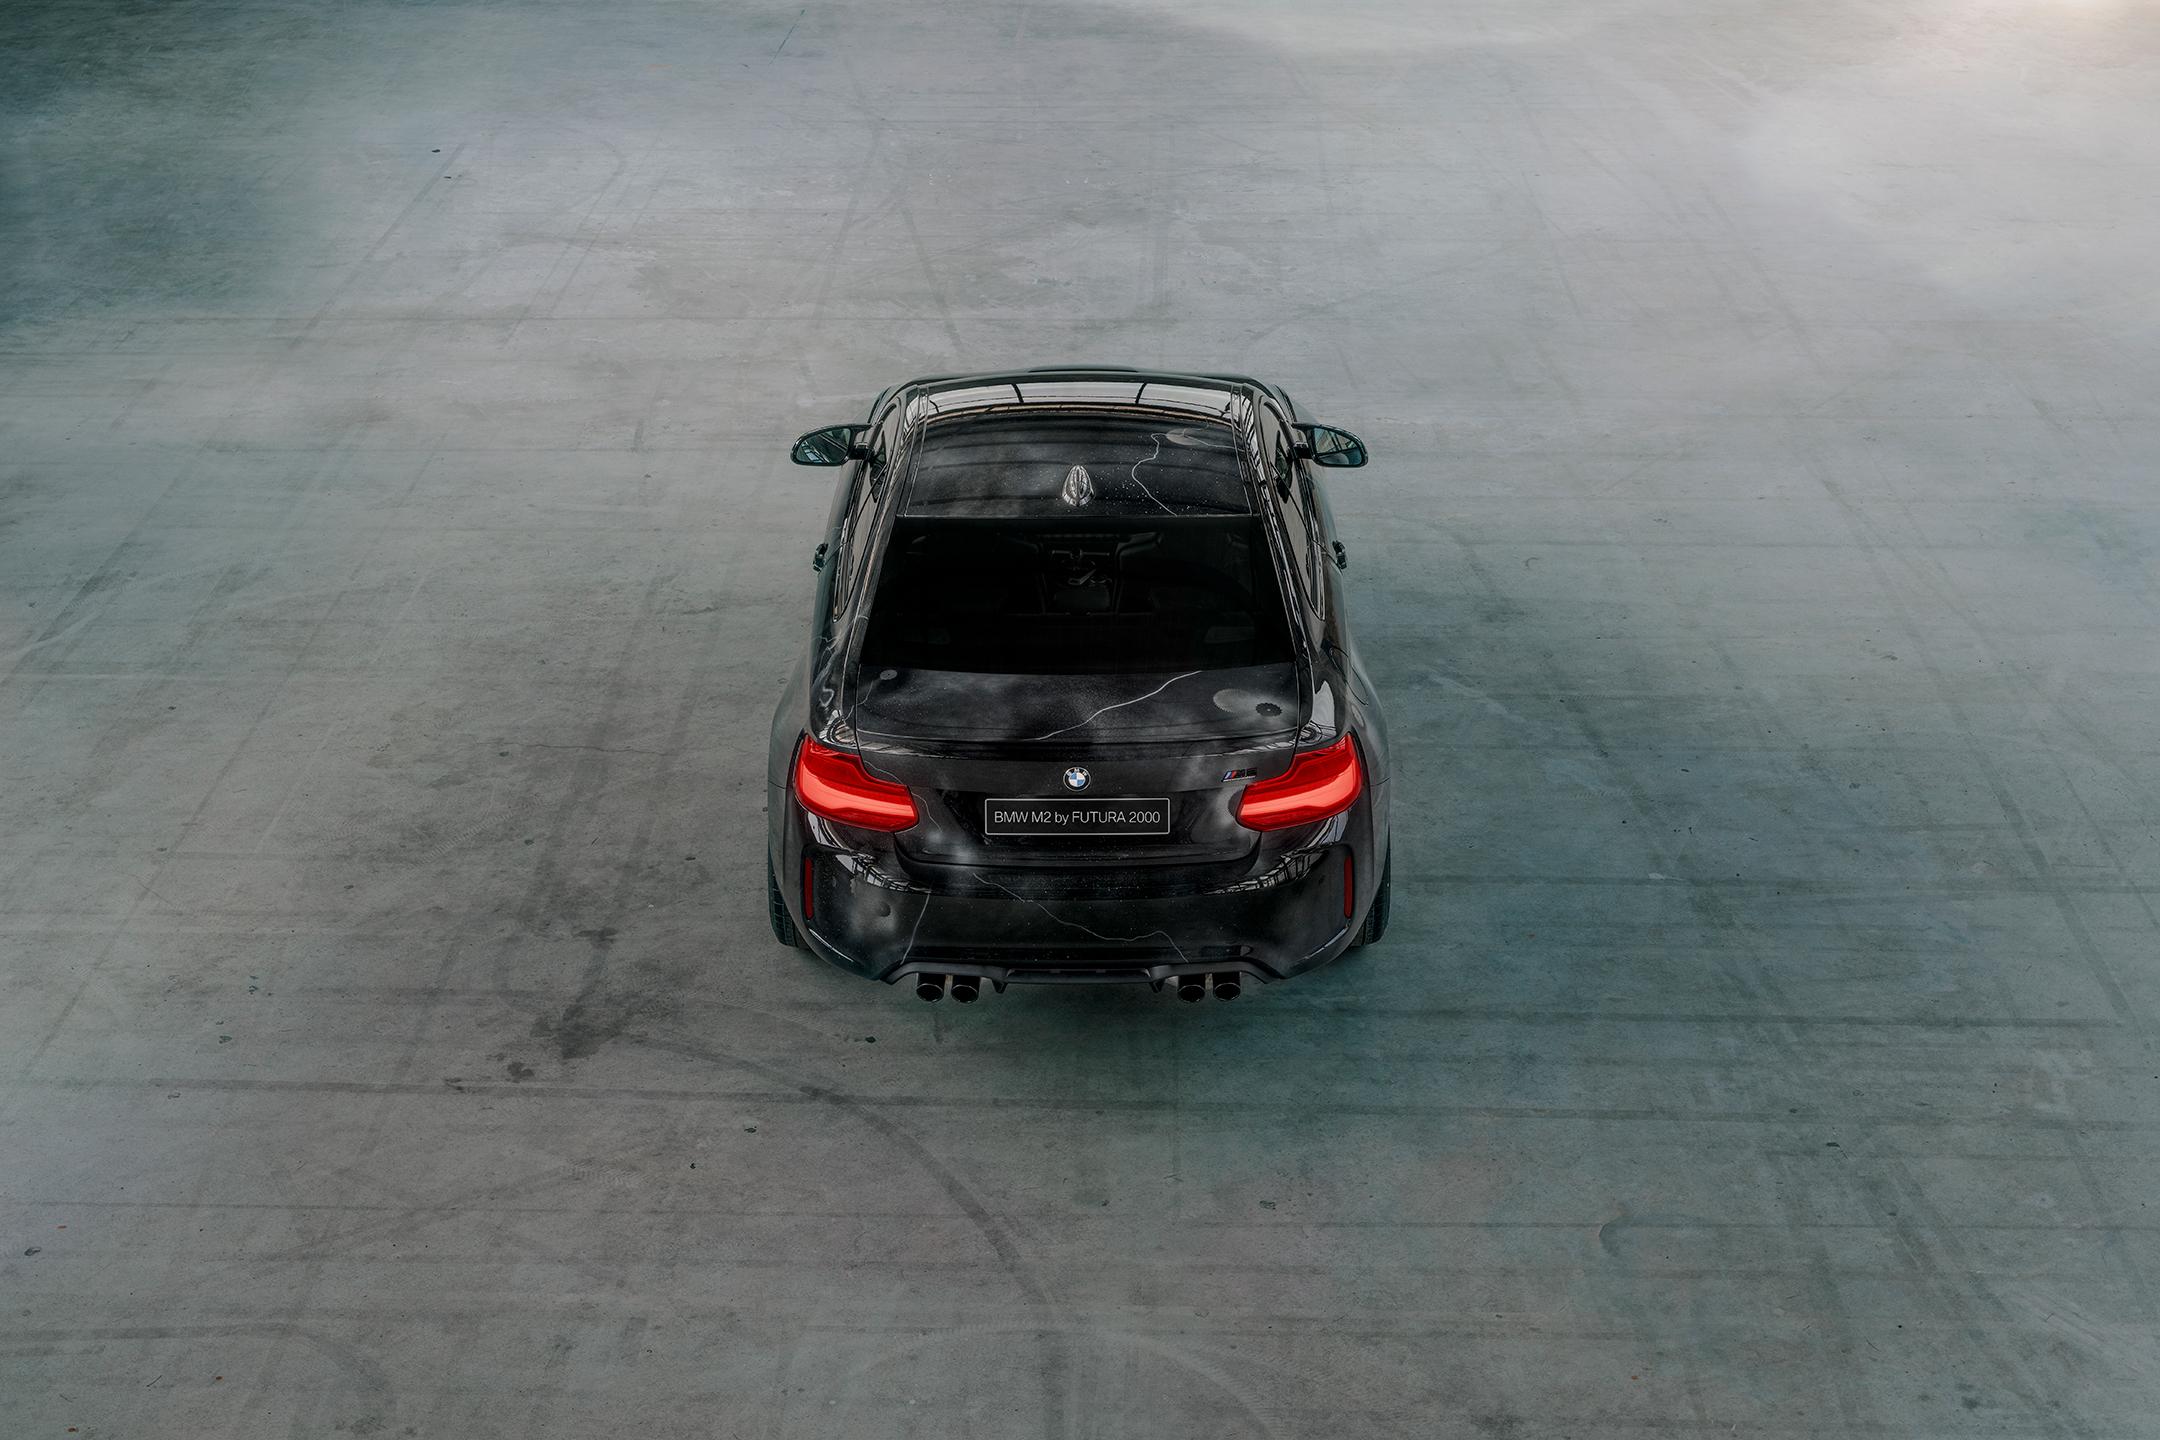 BMW M2 by FUTURA 2000 - Street Art Car - 2020 - top rear-face